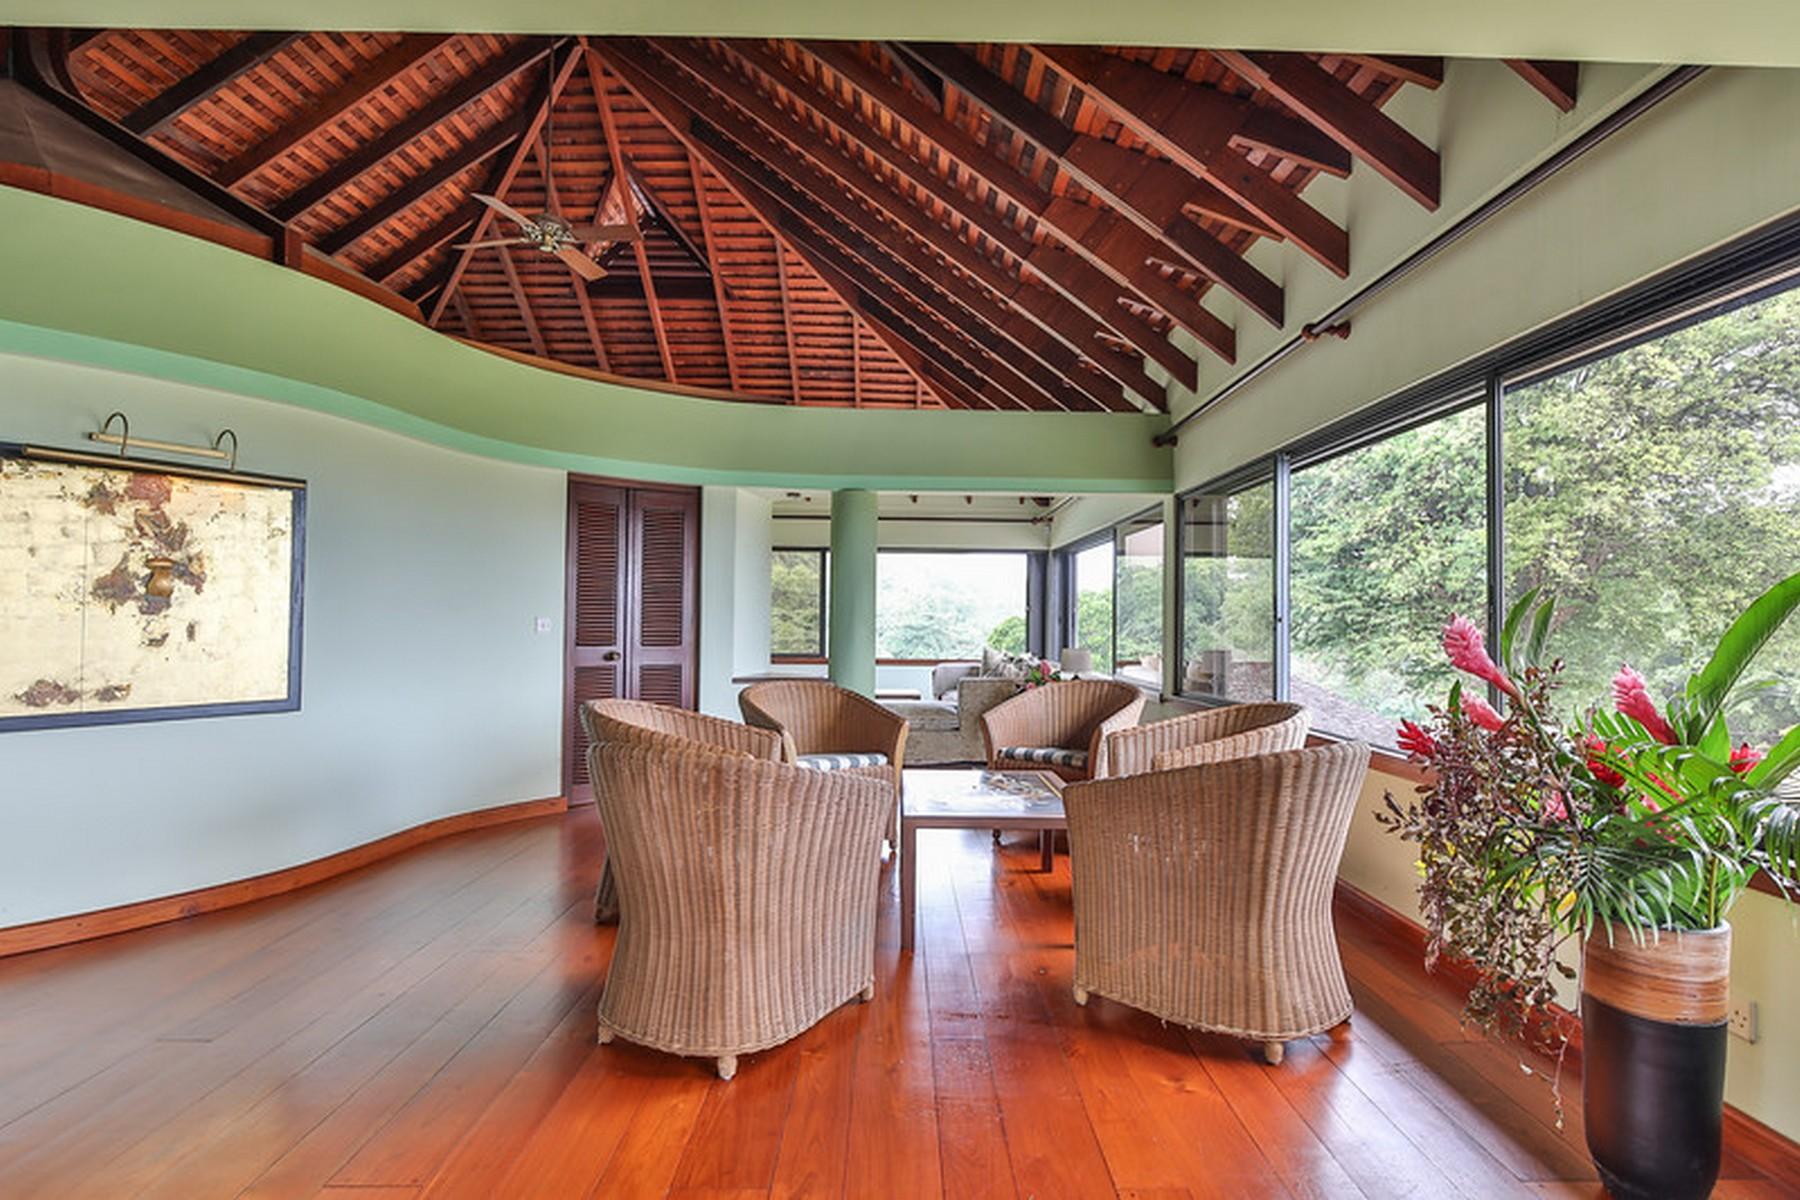 cap estate s open ceiling t lucia houses for sale